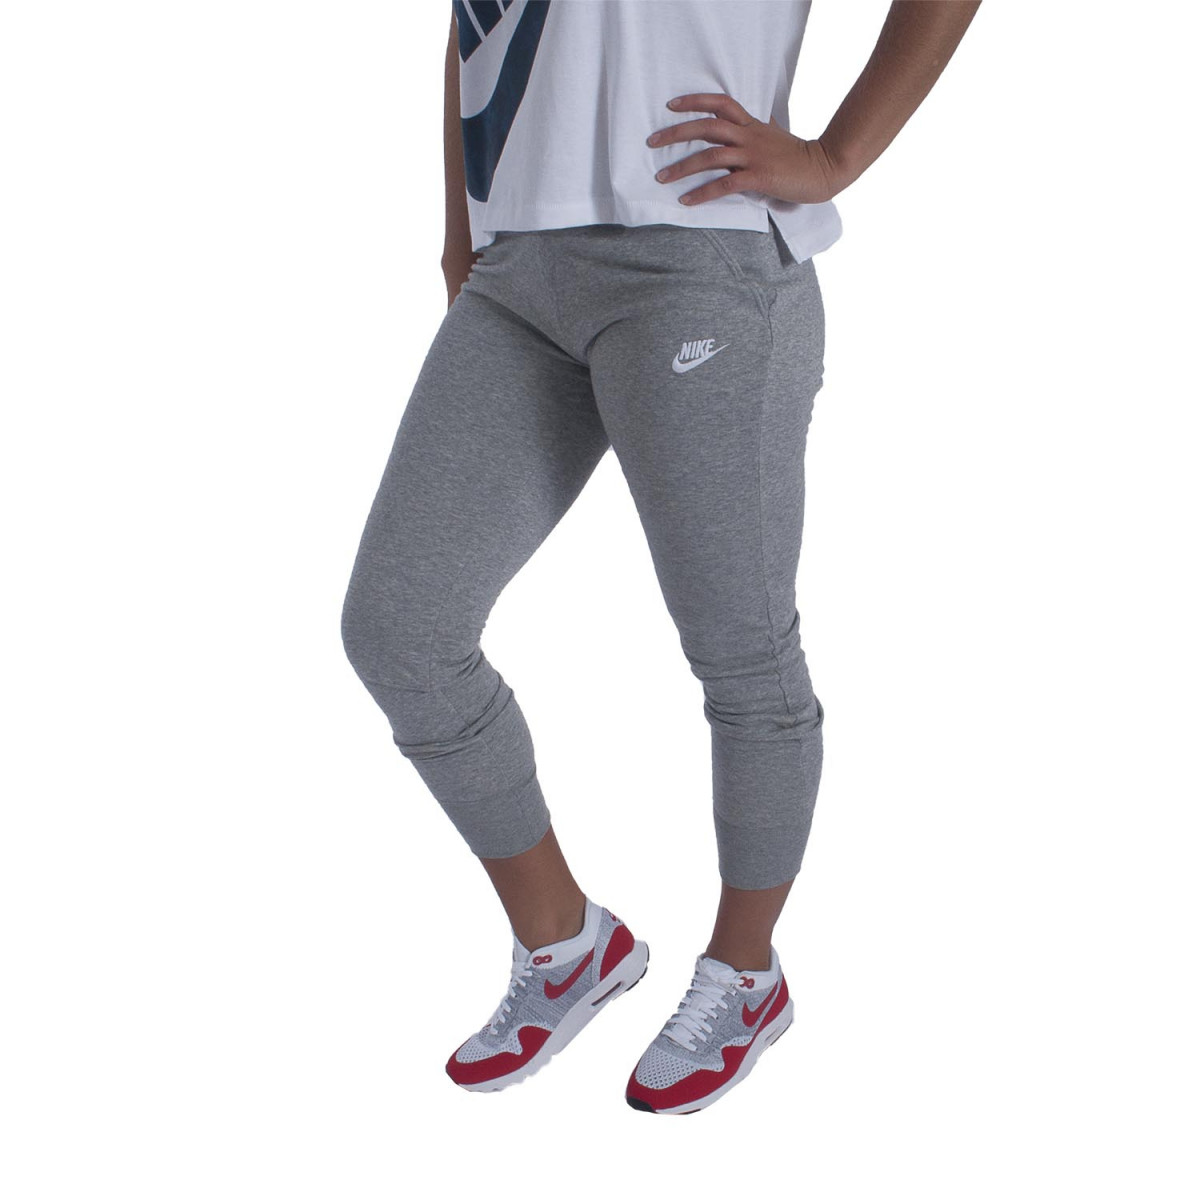 Pantalon Moda Nike Flc Nsw Pant Disciplina rxrAfqaw